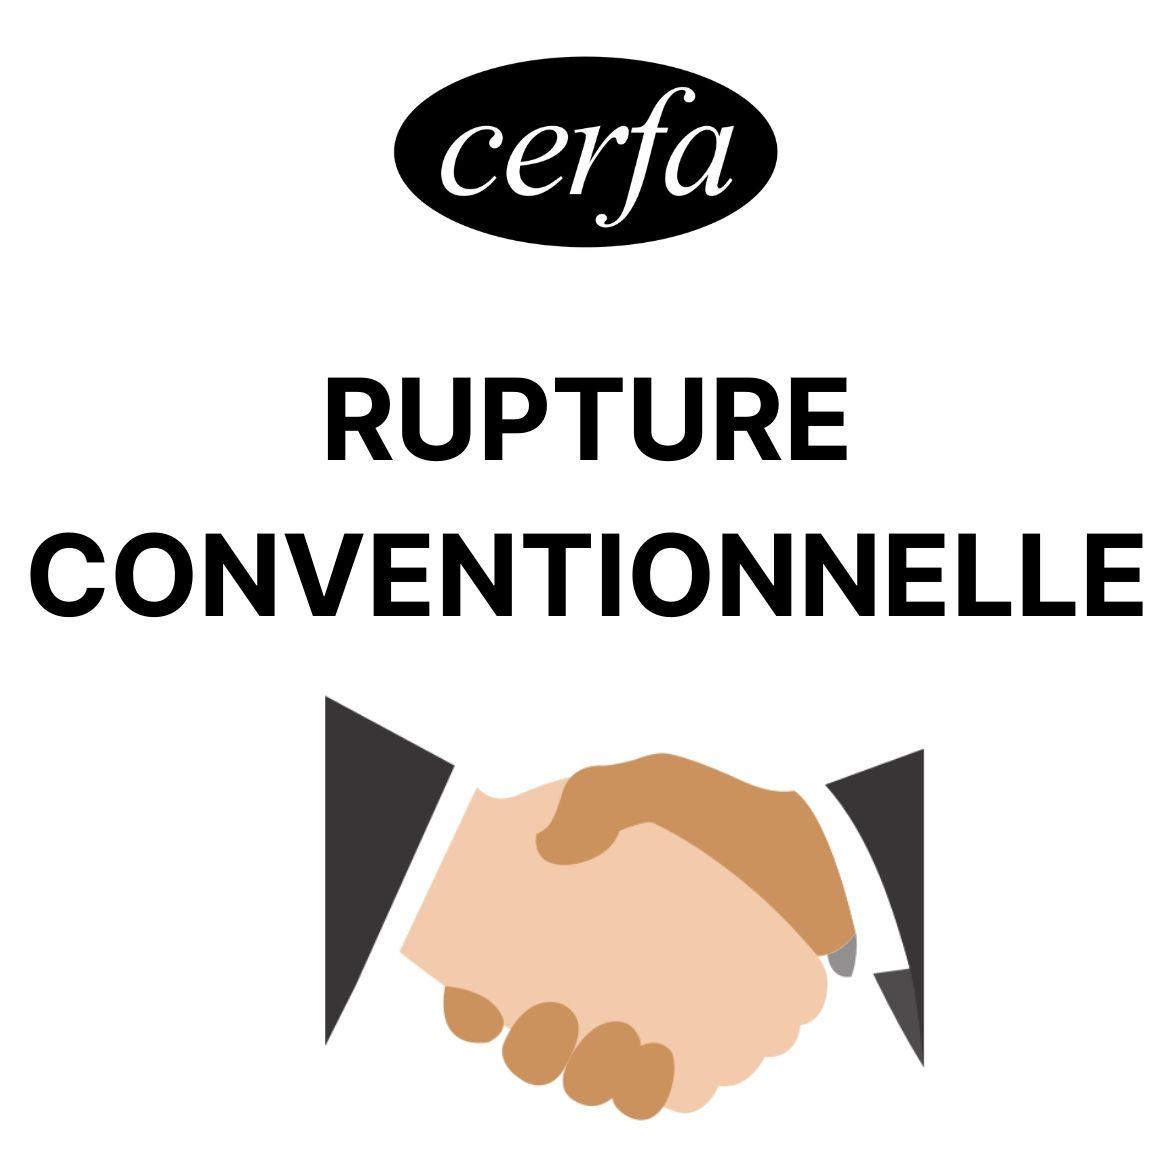 CERFA RUPTURE CONVENTIONNELLE DEMARCHE